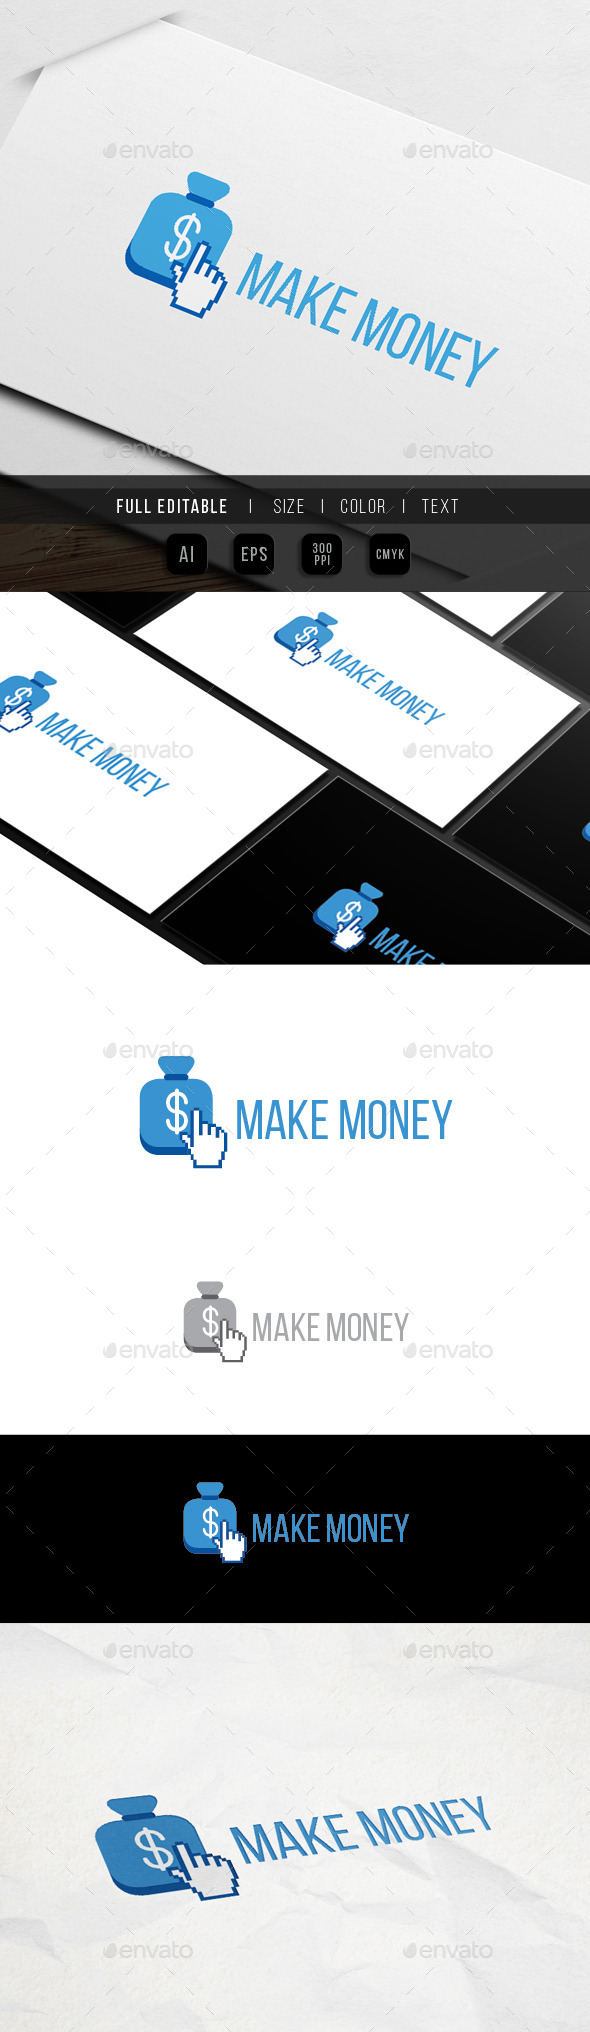 Click Money - Make Earn